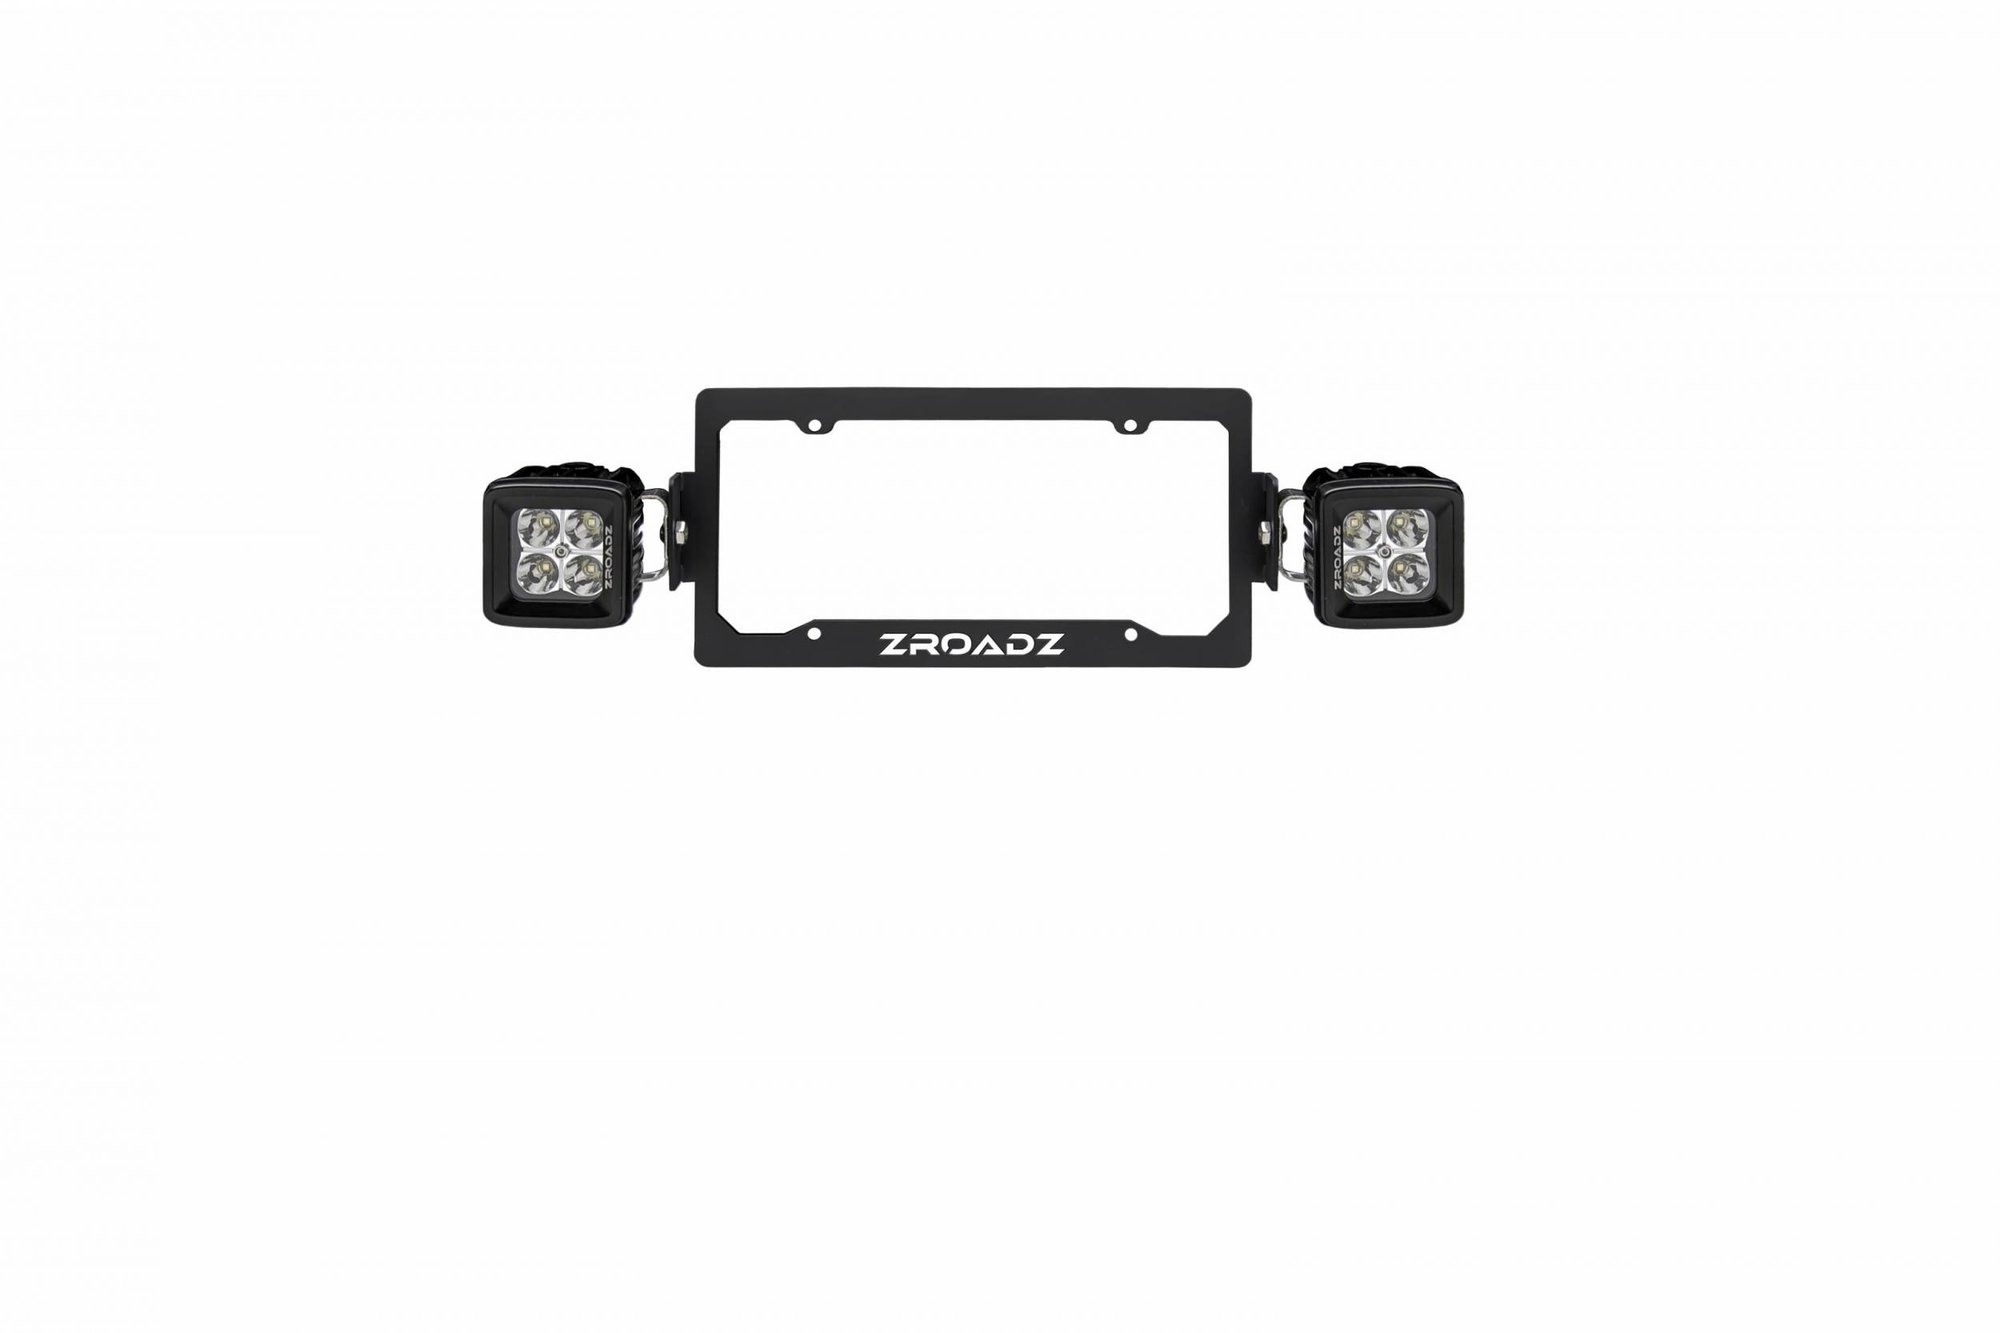 ZROADZ Z310005 License Plate Frame LED Bracket to Mount (2